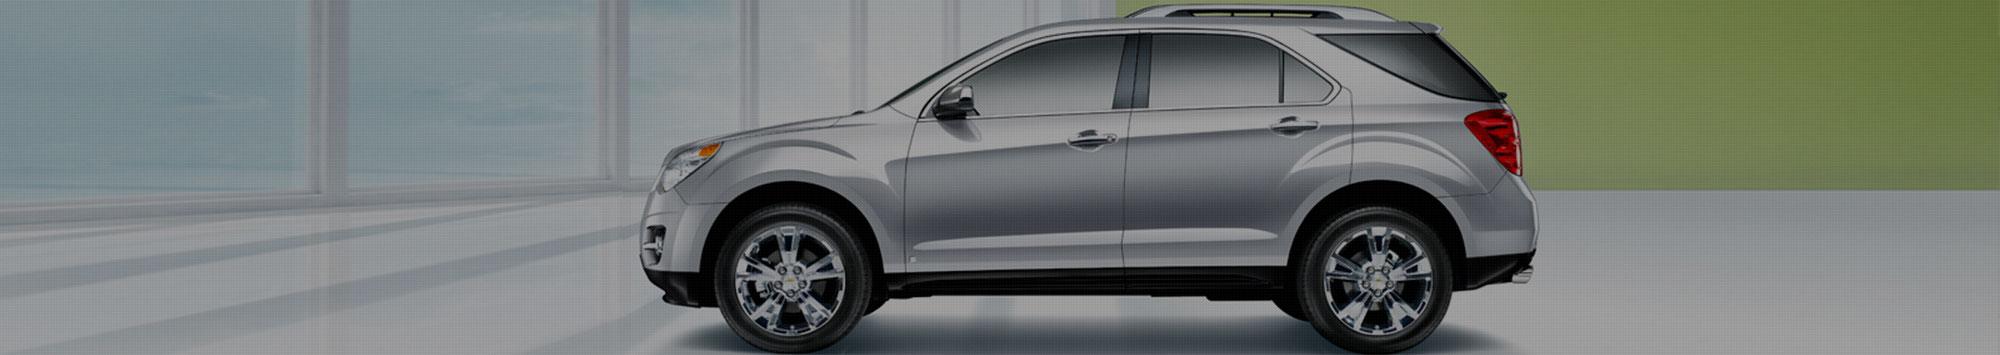 Cameron Auto Sales Llc Used Cars Weslaco Tx Dealer